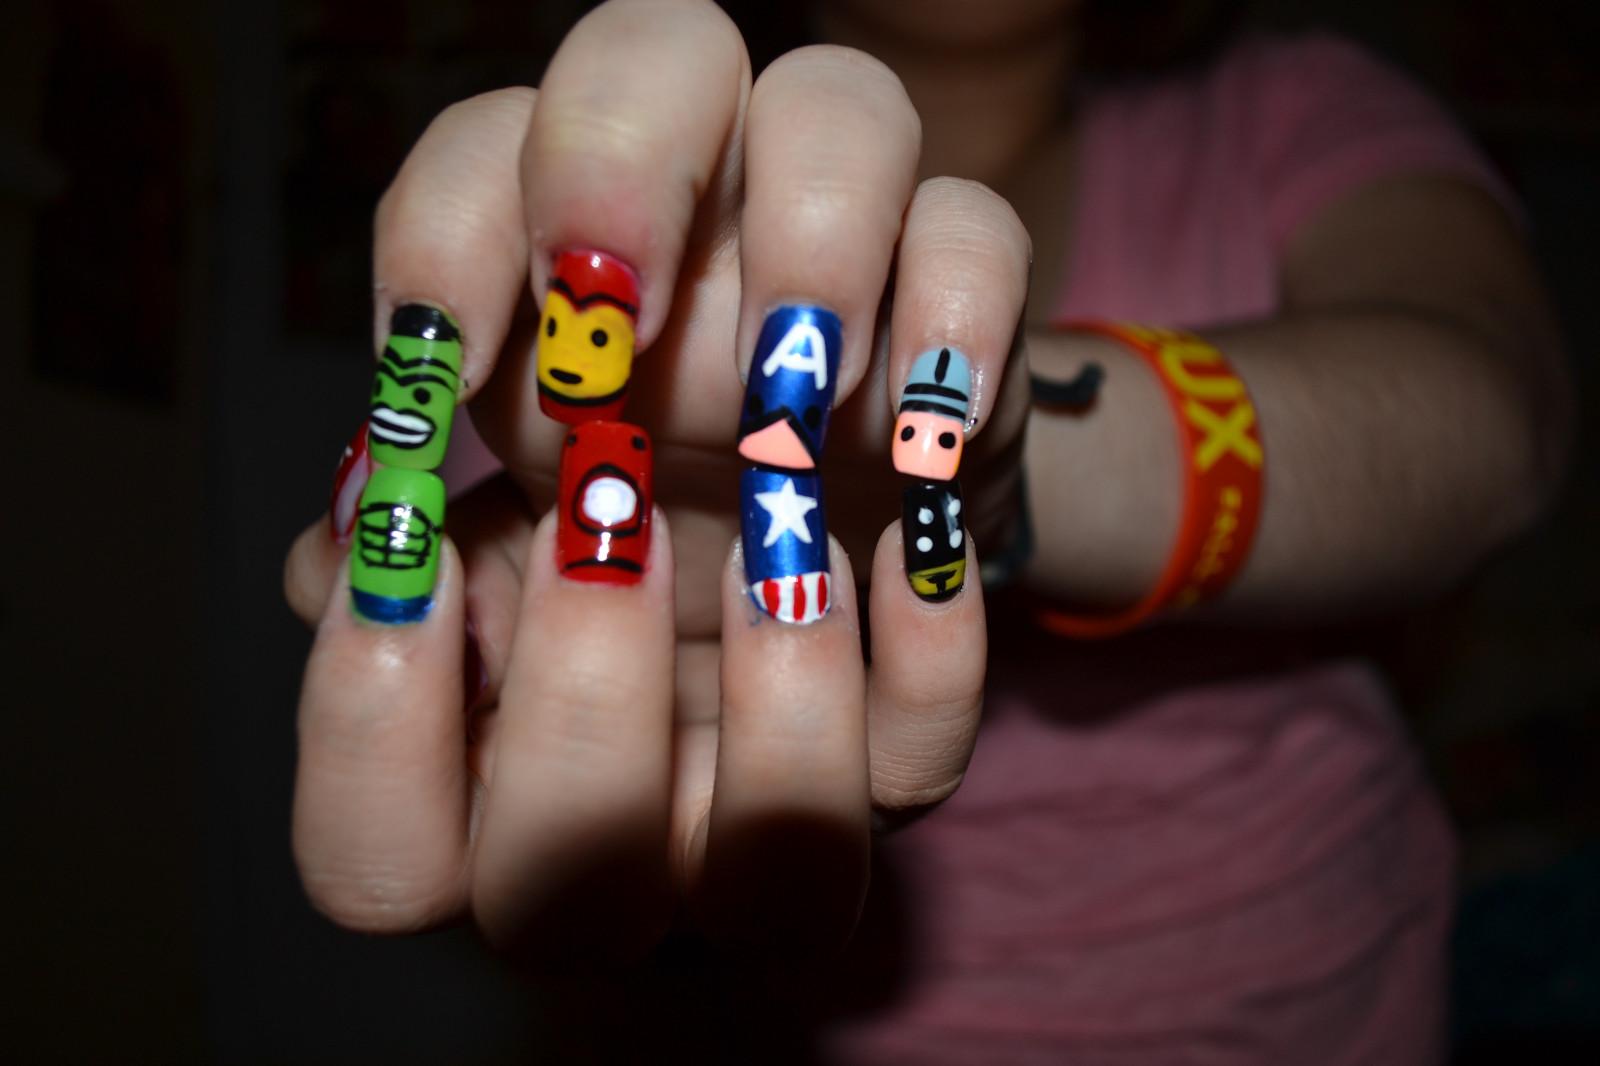 Wallpaper : Thor, hero, Hulk, nails, Demigod, ART, cute, adorable ...